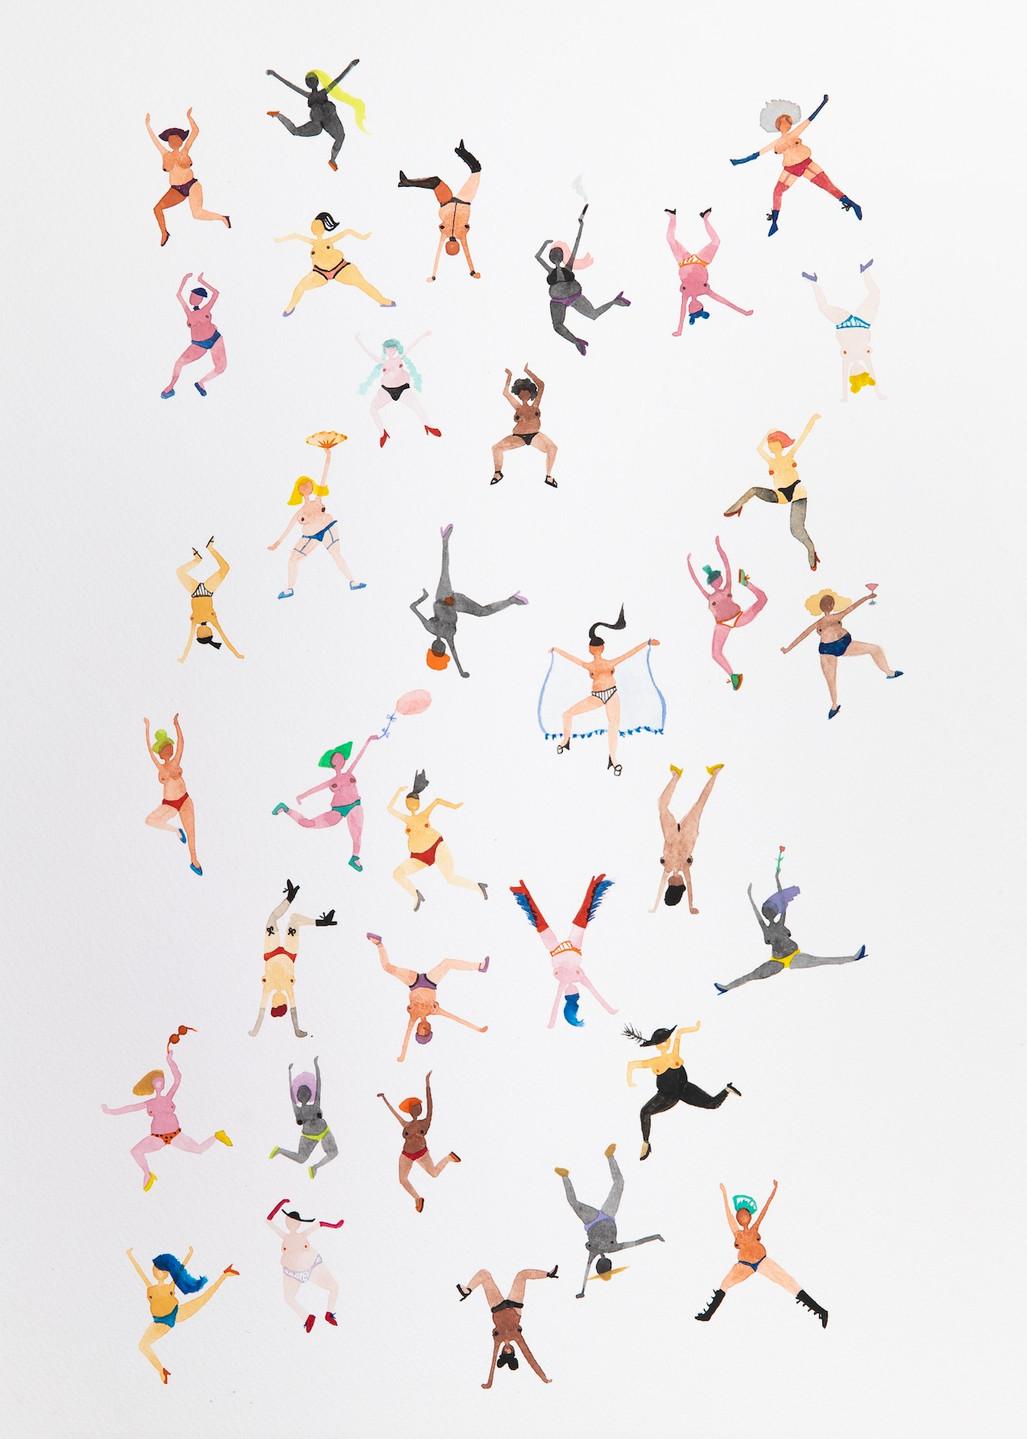 The Never-Ending Dance 29.7 x 42.0cm Watercolour Painting.